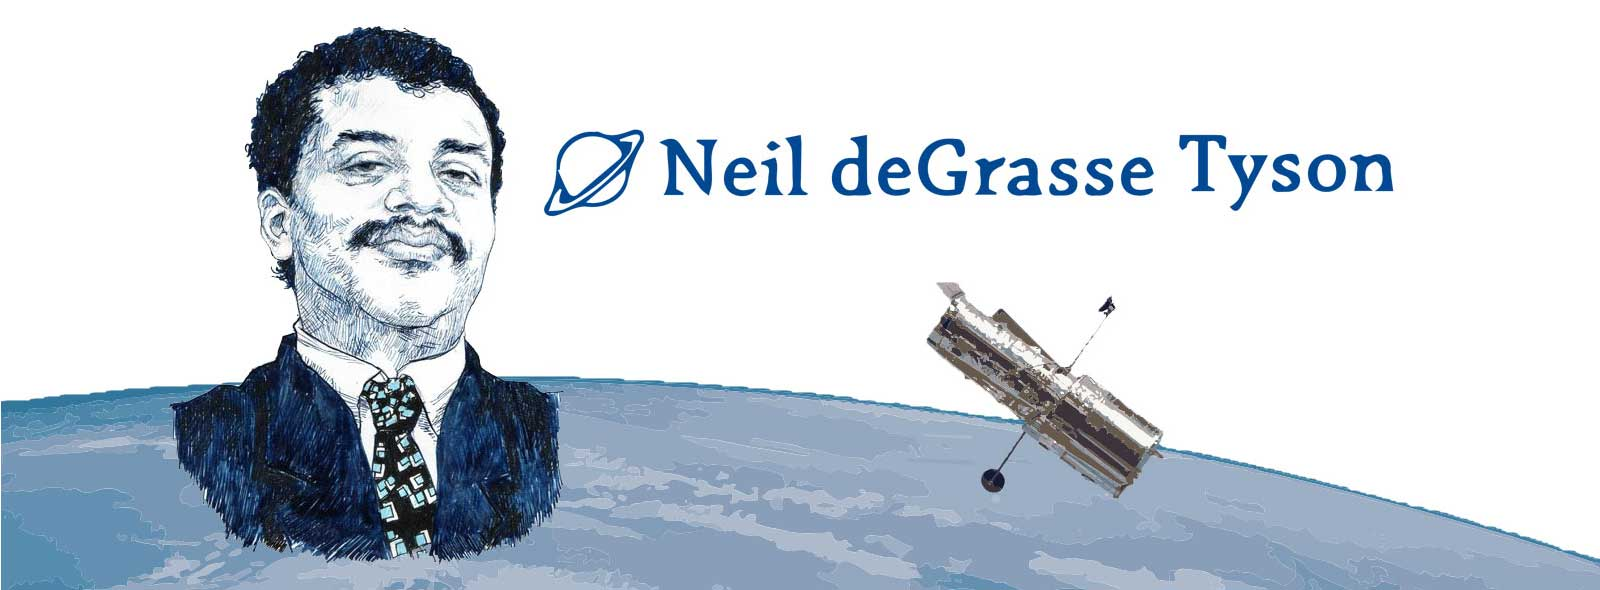 Neil deGrasse Tyson 2019_1600x590.jpg